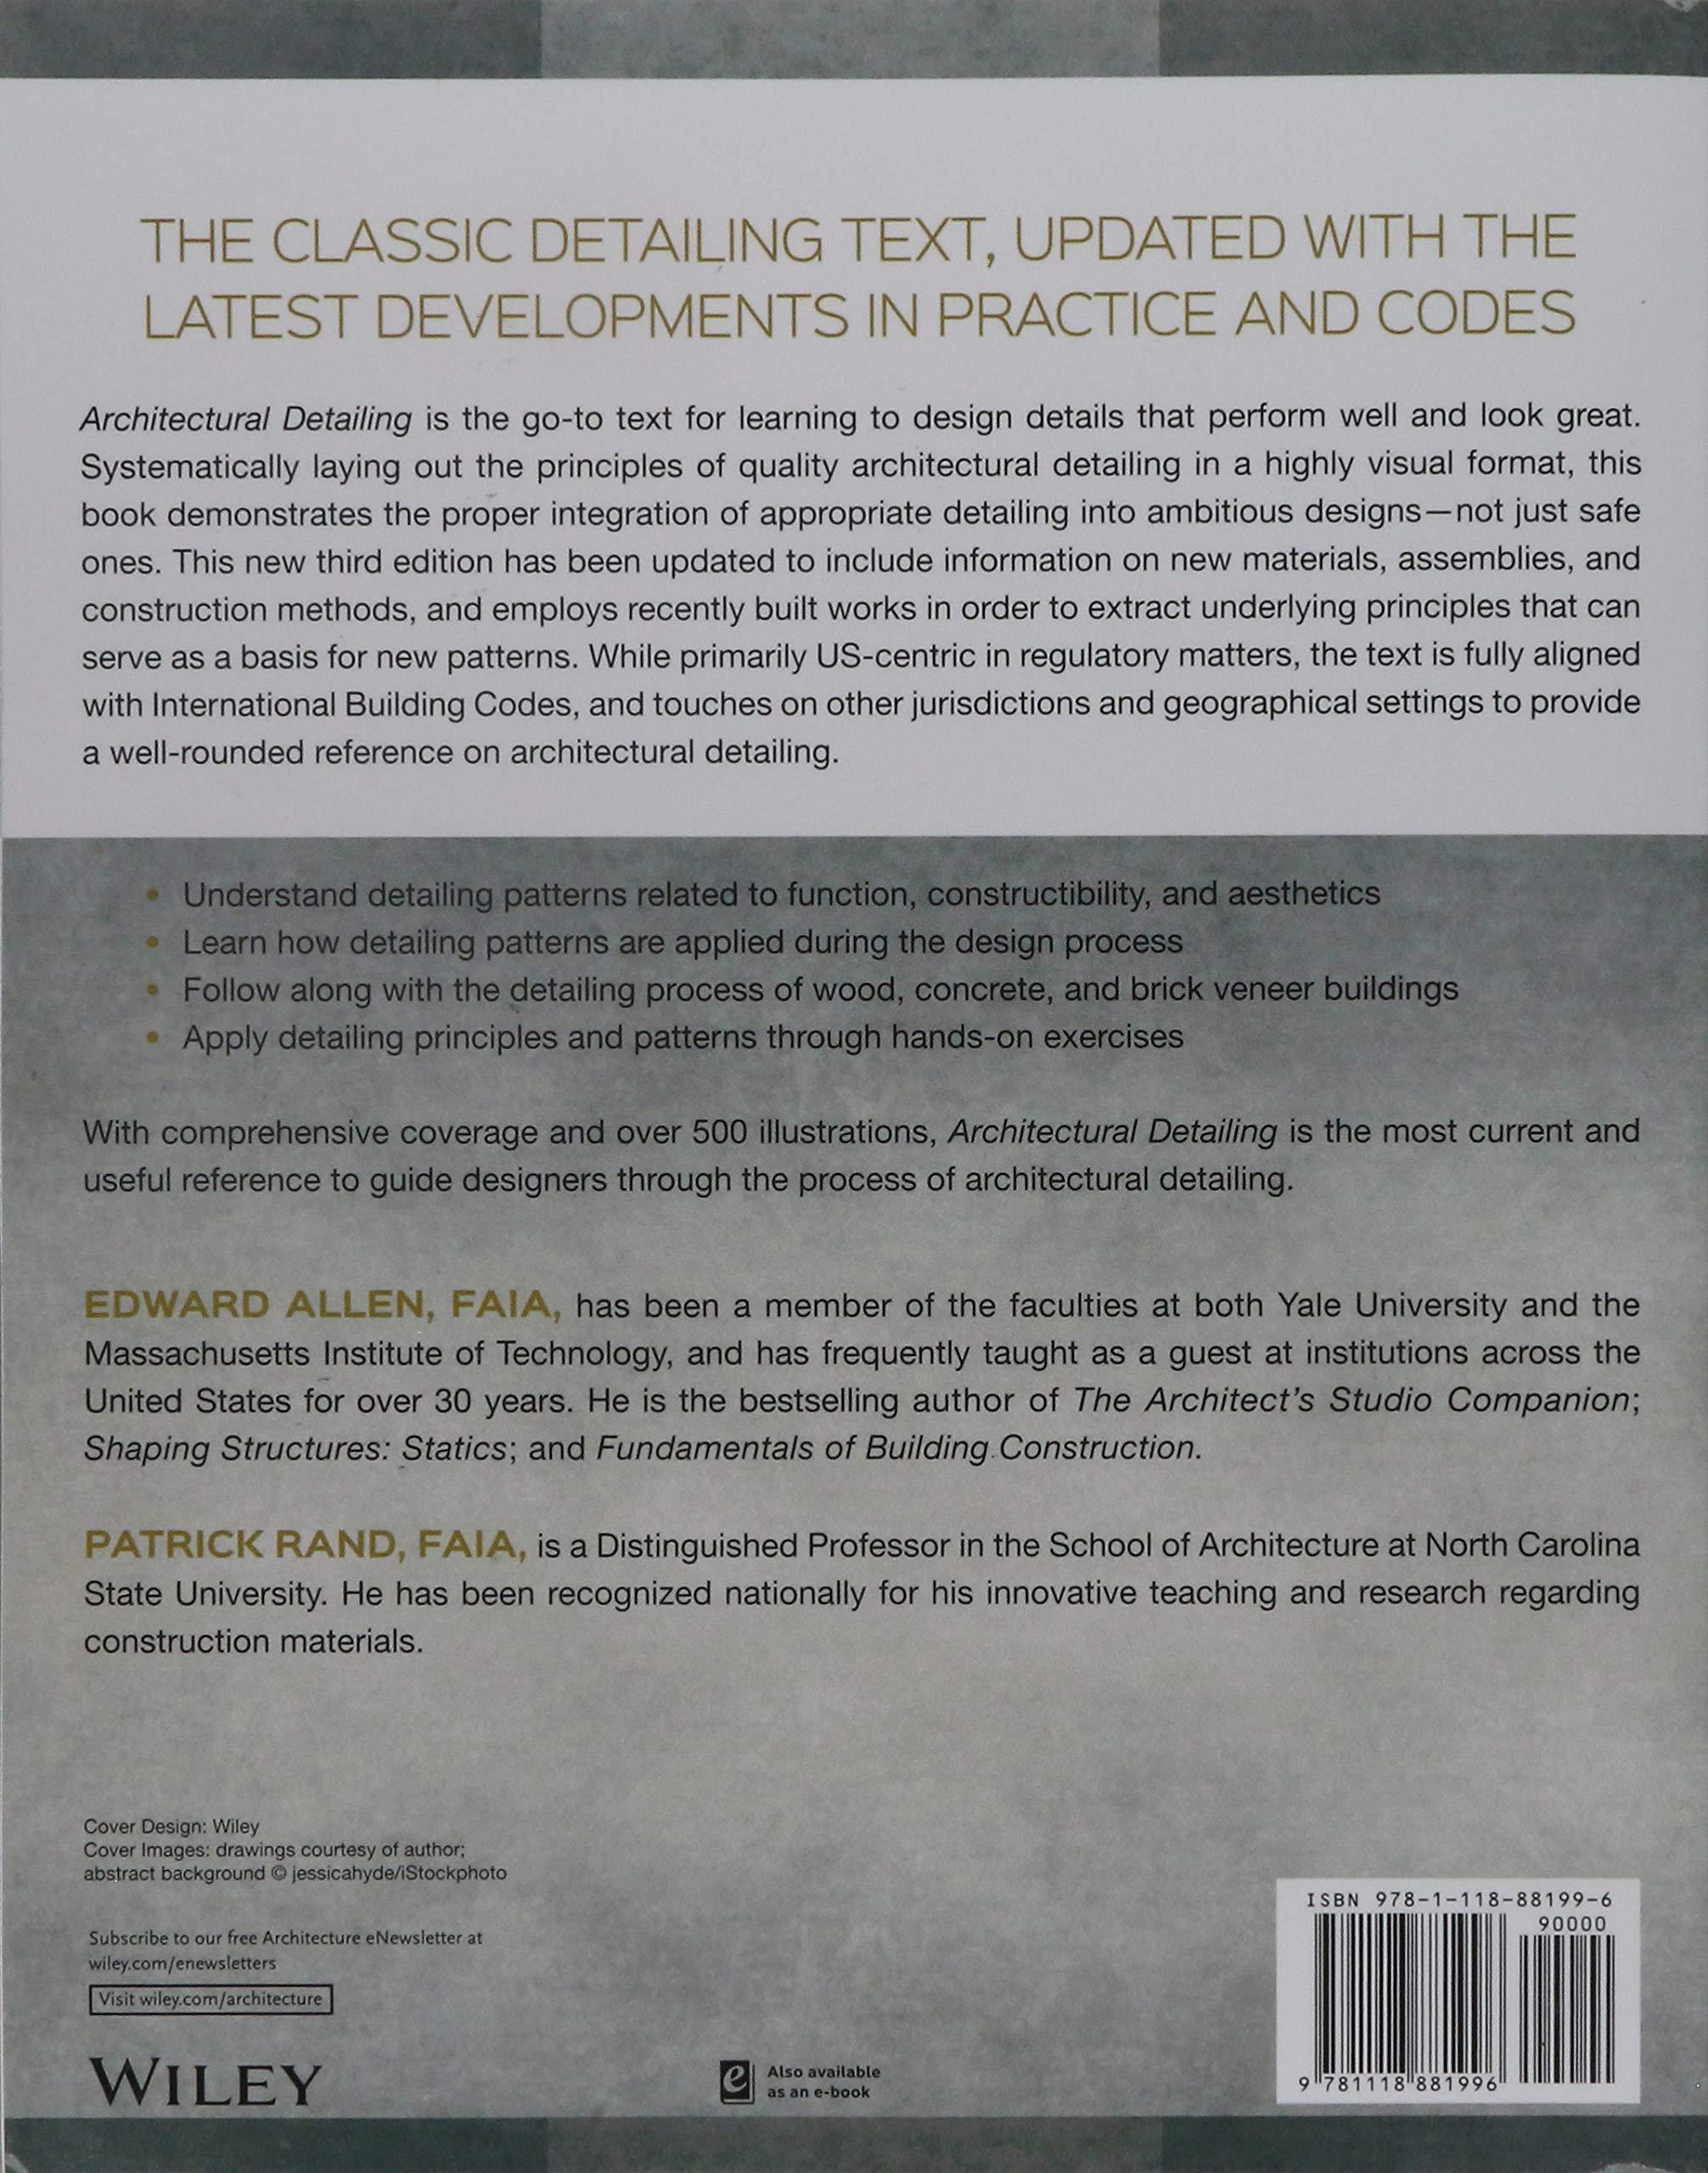 Architectural Detailing: Function, Constructibility, Aesthetics, 3rd  Edition: Amazon.co.uk: Edward Allen: 9781118881996: Books